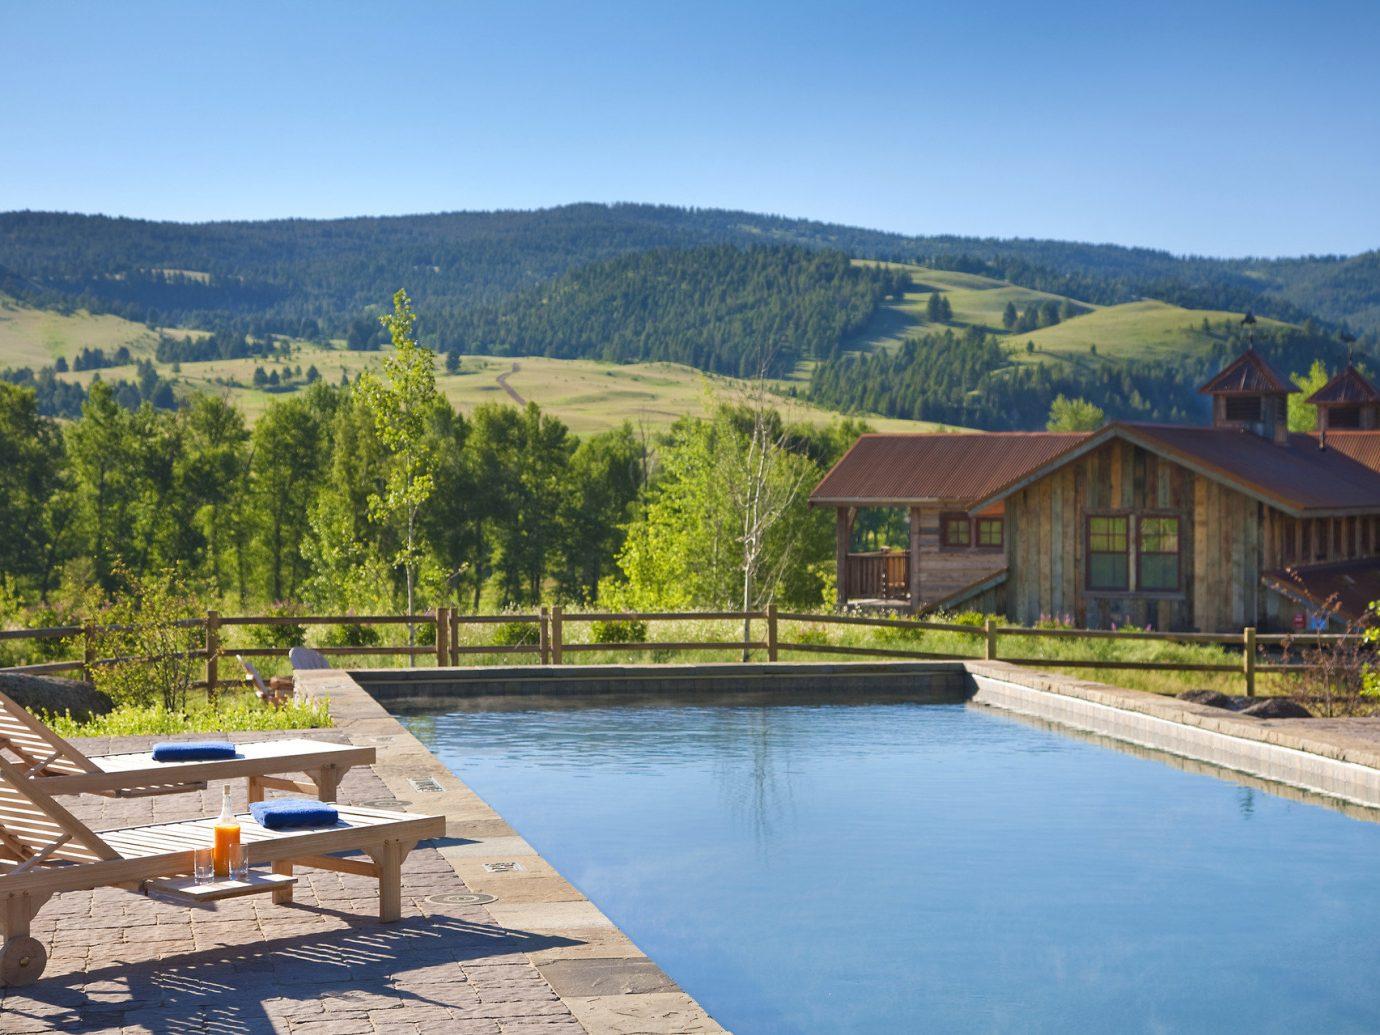 All-Inclusive Resorts Hotels Romance outdoor mountain water property swimming pool estate Nature real estate Villa cottage Resort backyard Lake Island shore